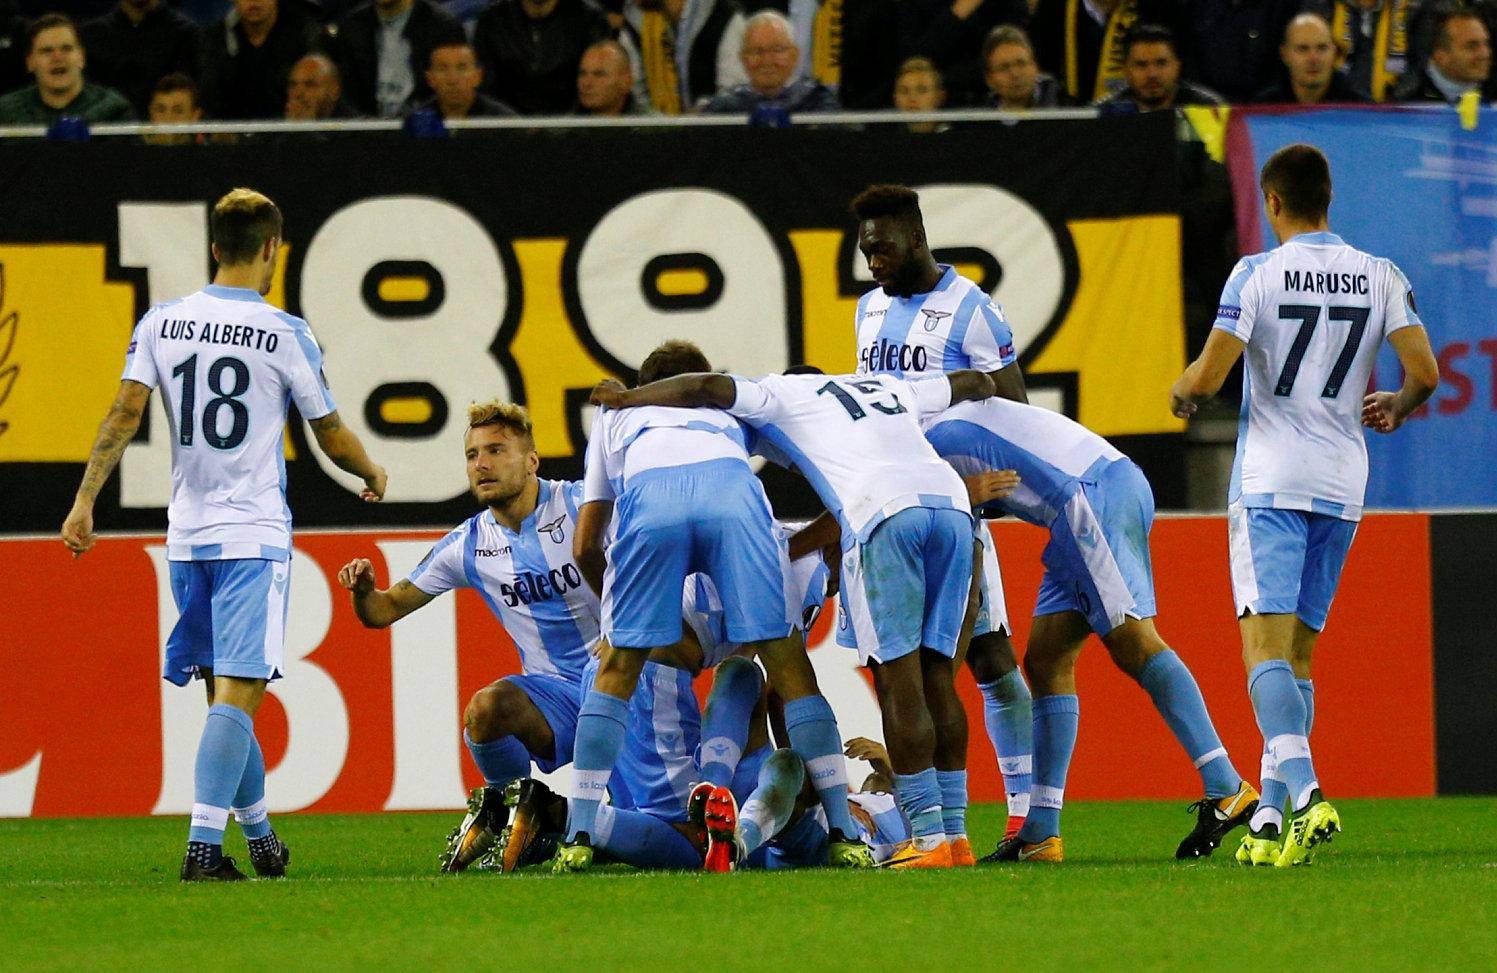 Europa League - Vitesse vs Lazio Roma